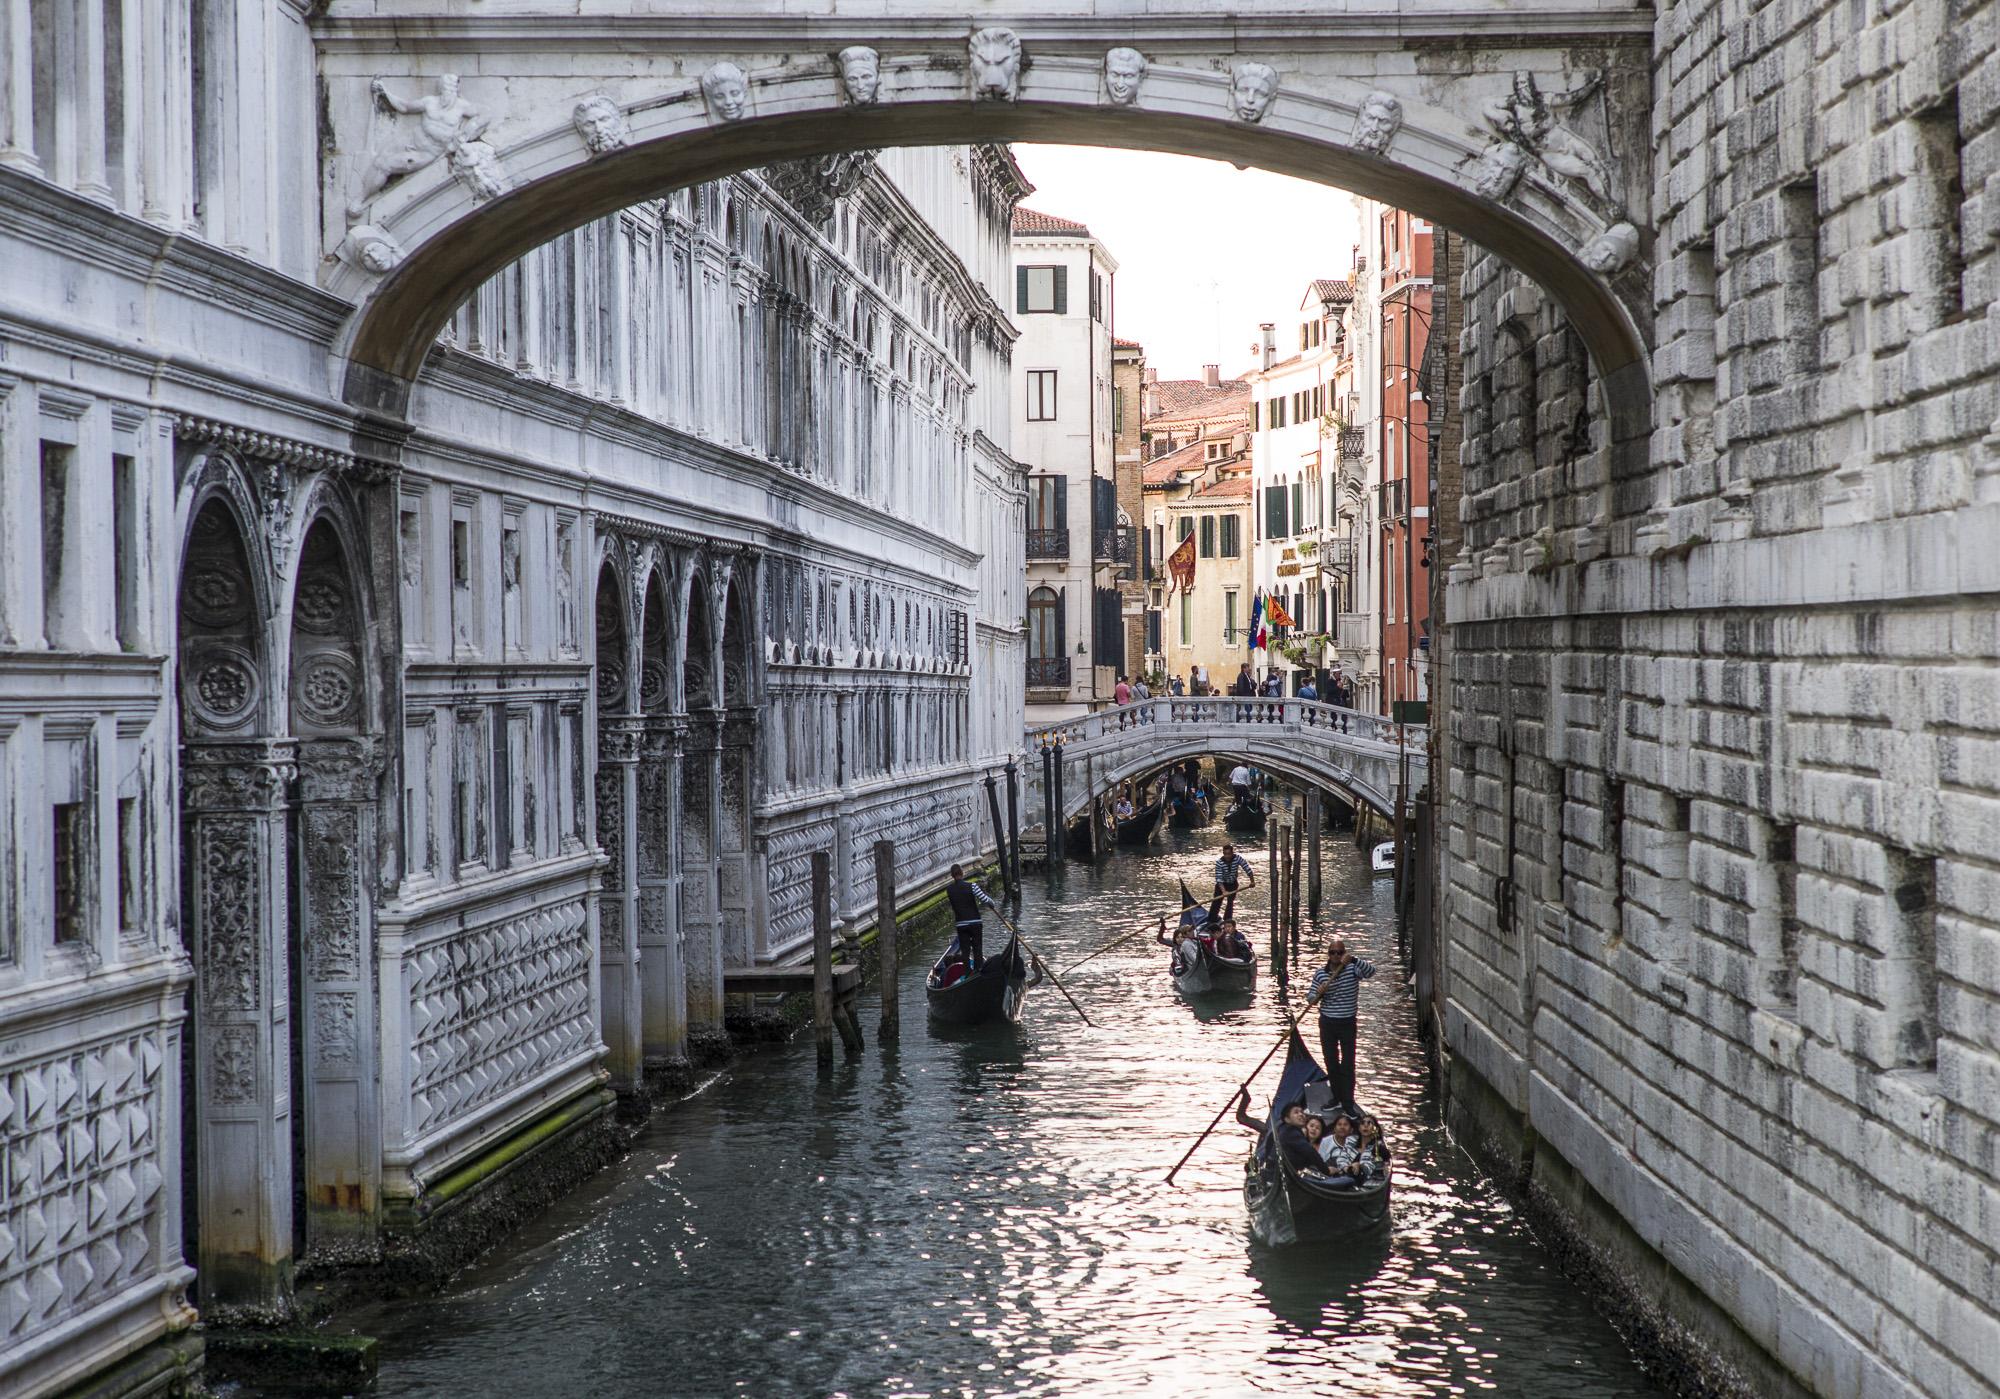 Gondolas on the Canal